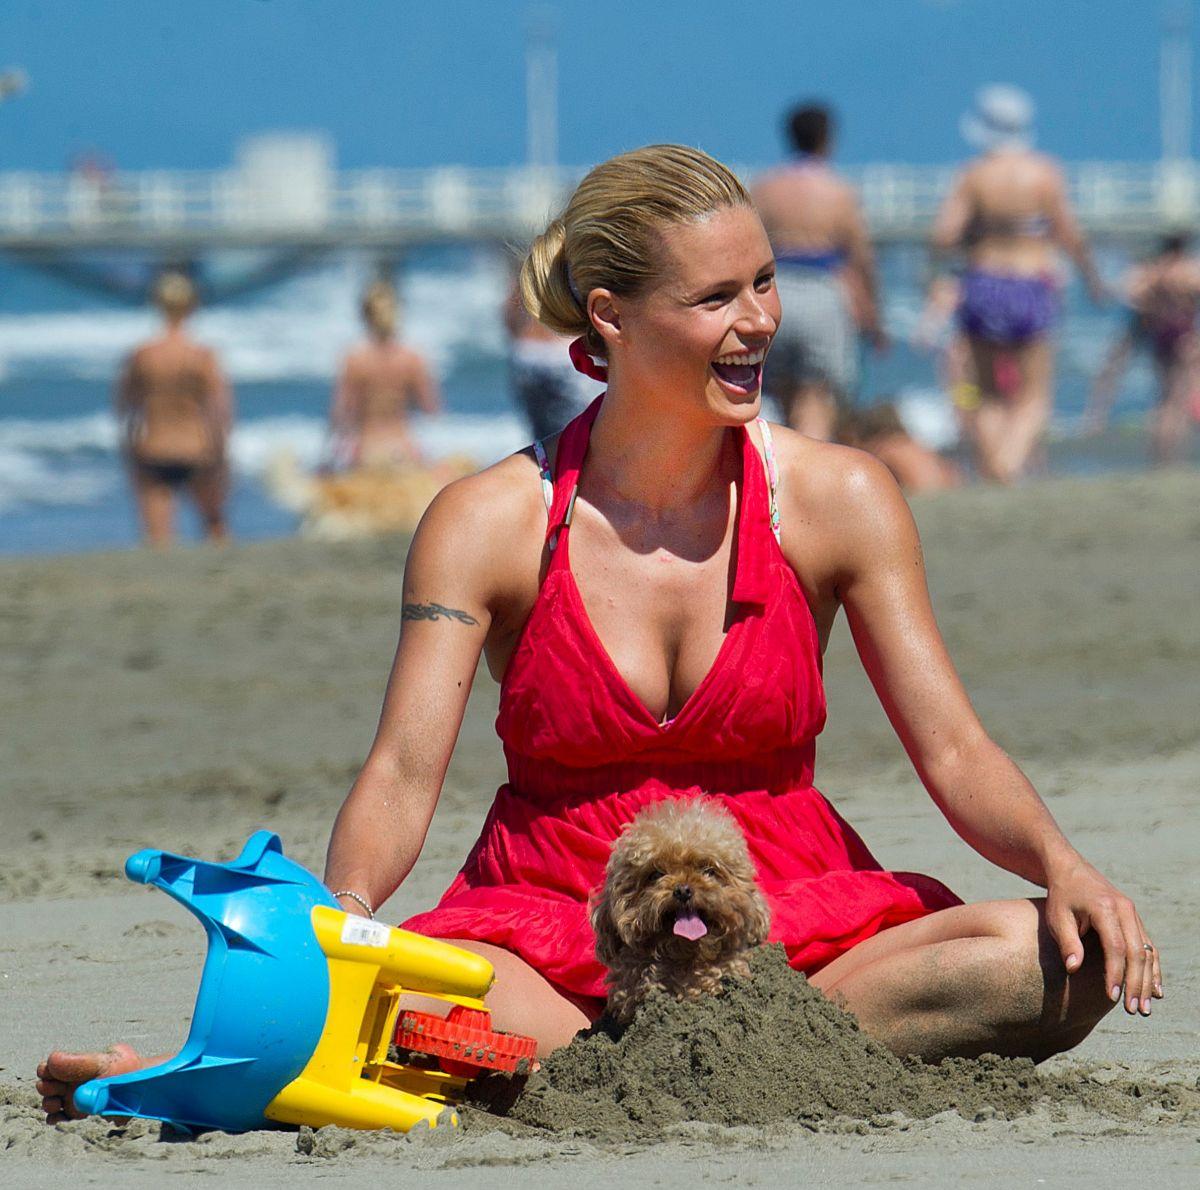 MICHELLE HUNZIKER at a Beach in Forte Dei Marmi 06/24/2015